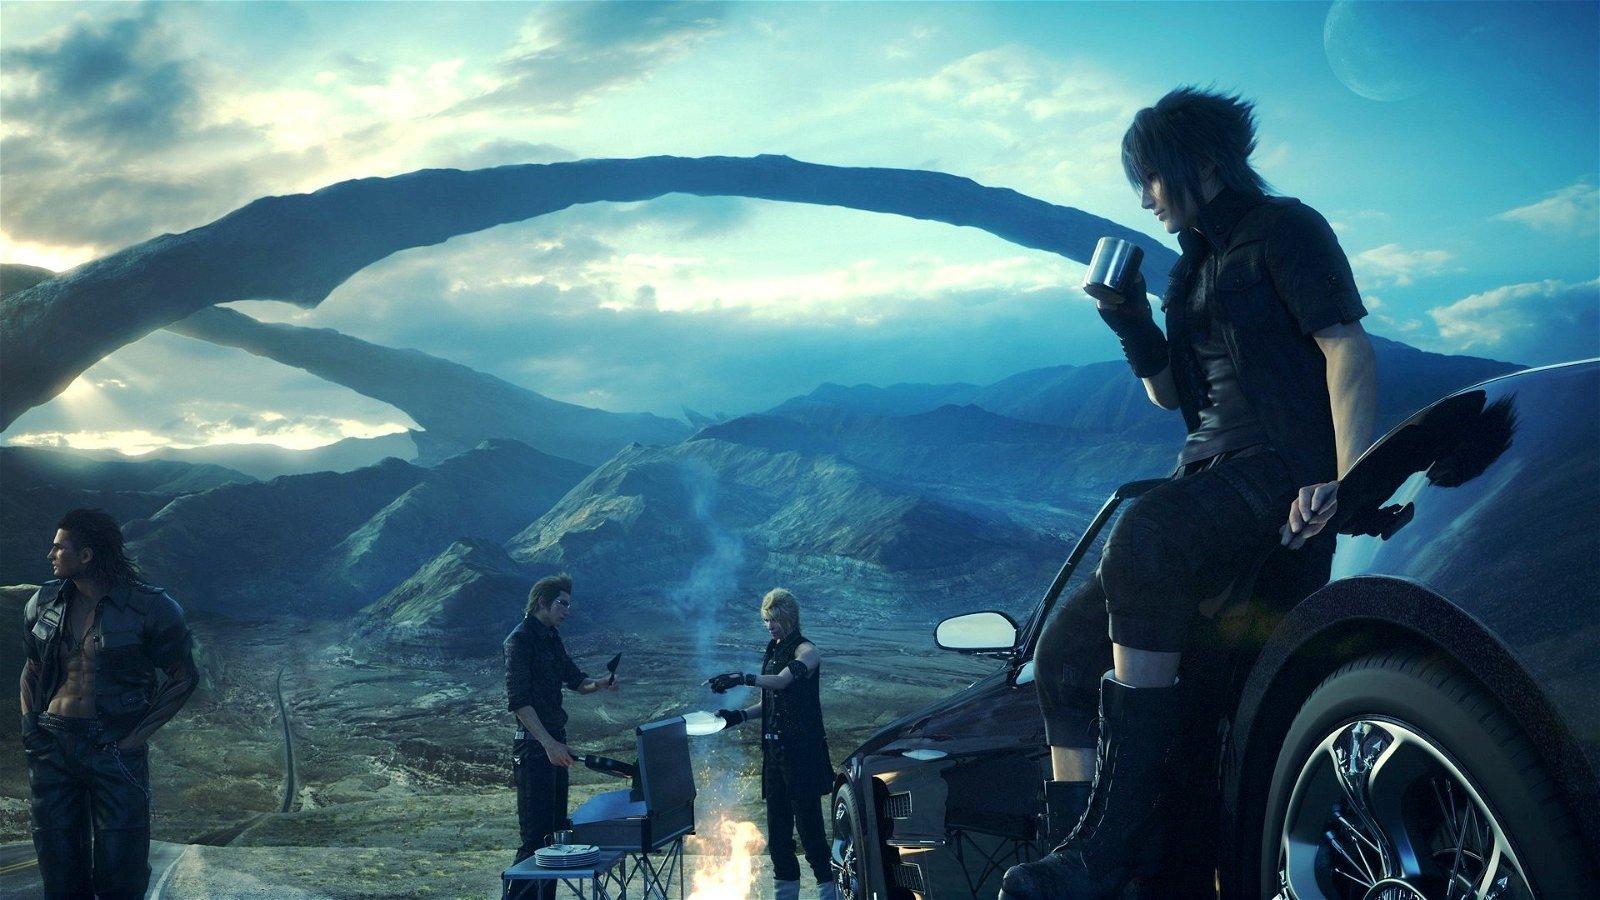 Developer Explains Current State of Final Fantasy XV Production